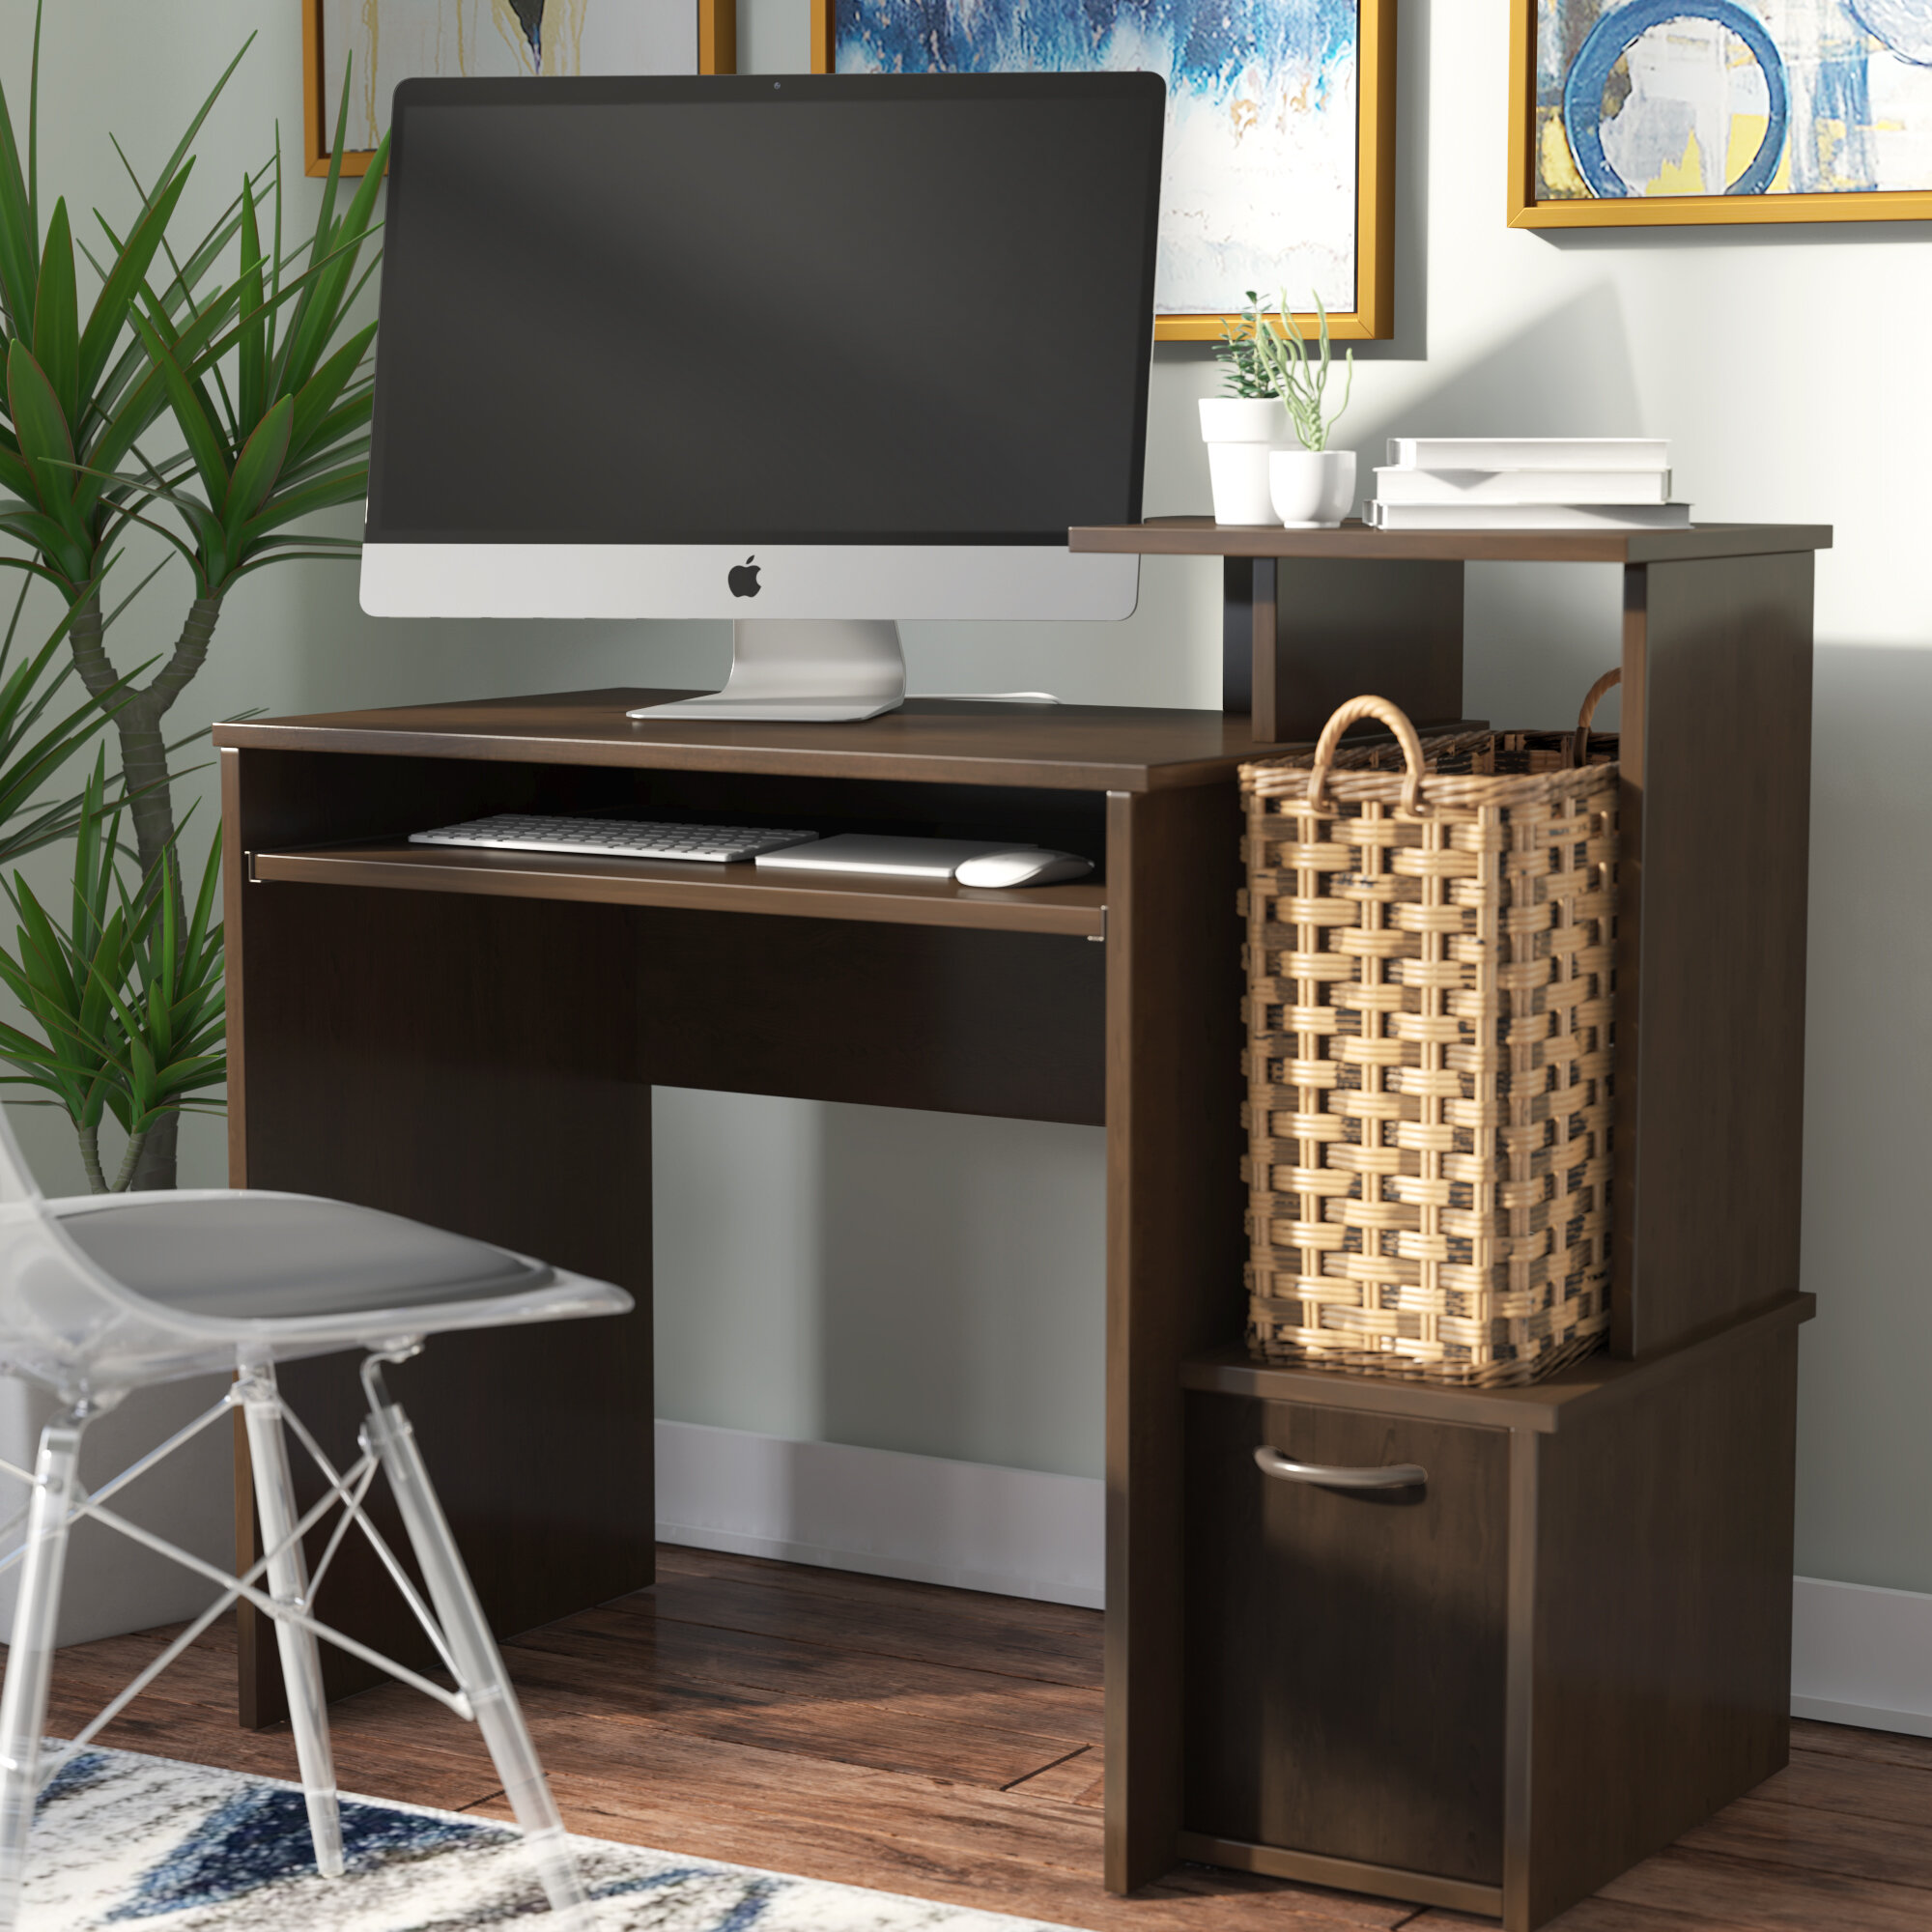 Zipcode Design Everett Computer Desk U0026 Reviews | Wayfair